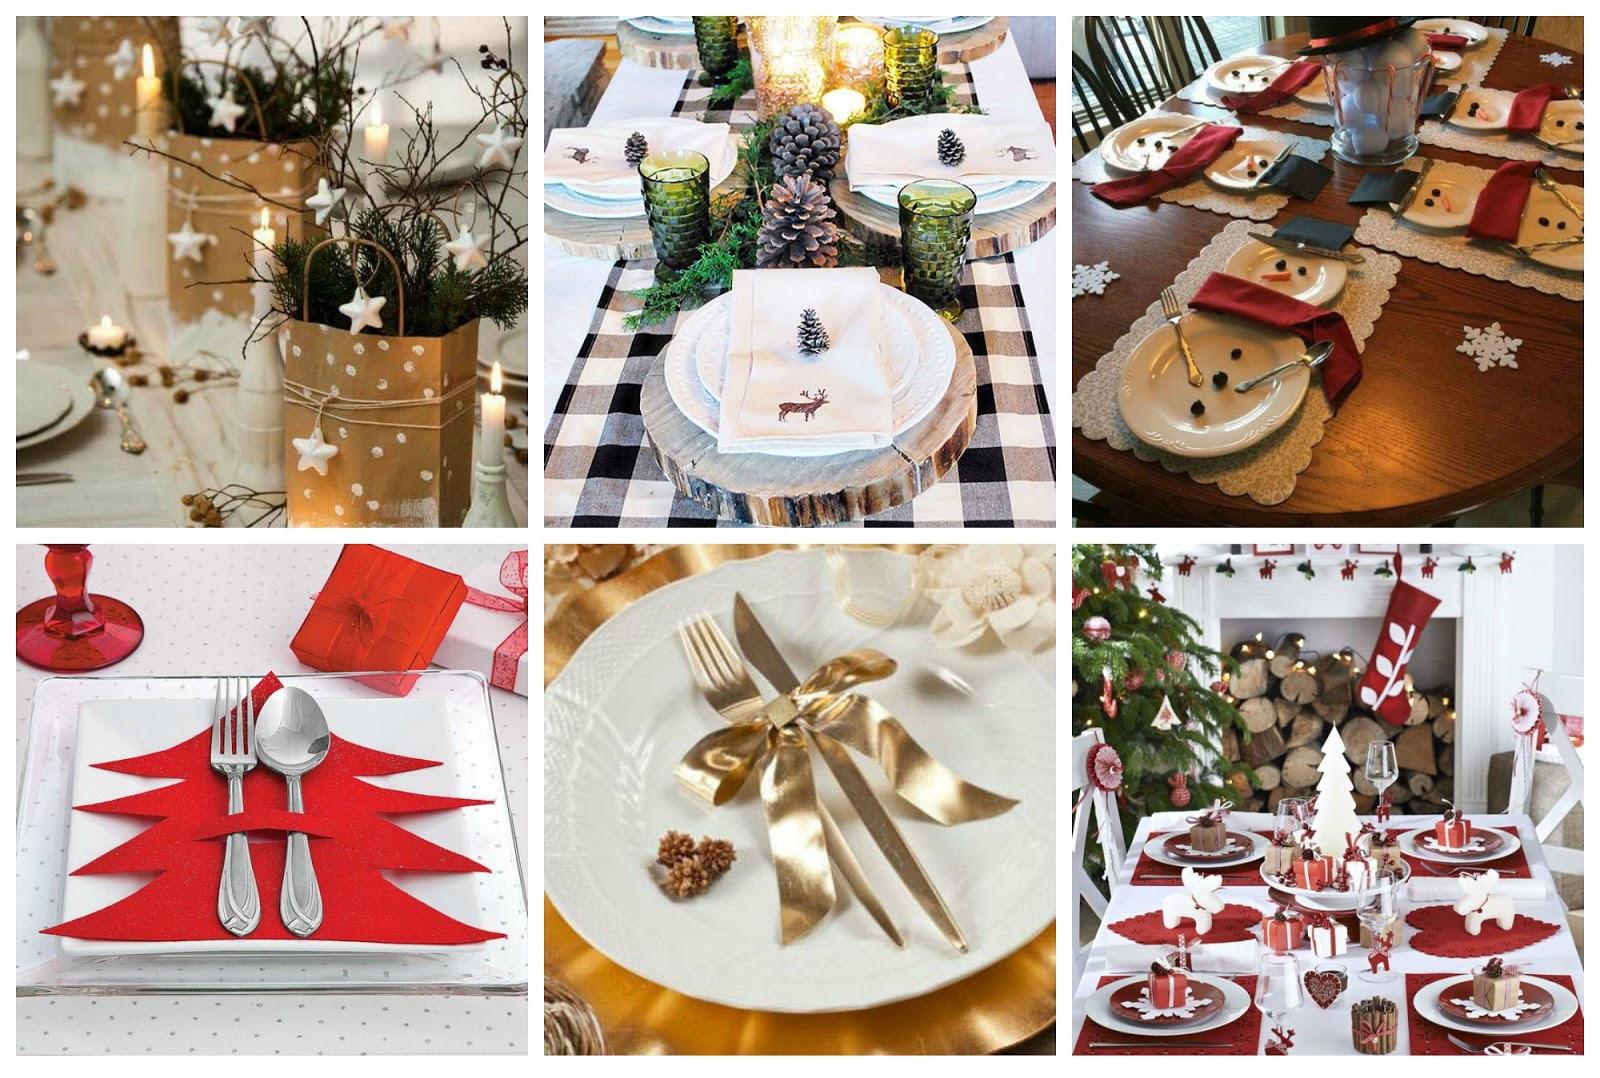 Tavola di natale tante idee fai da te donneinpink magazine - Addobbi natalizi per tavola da pranzo ...